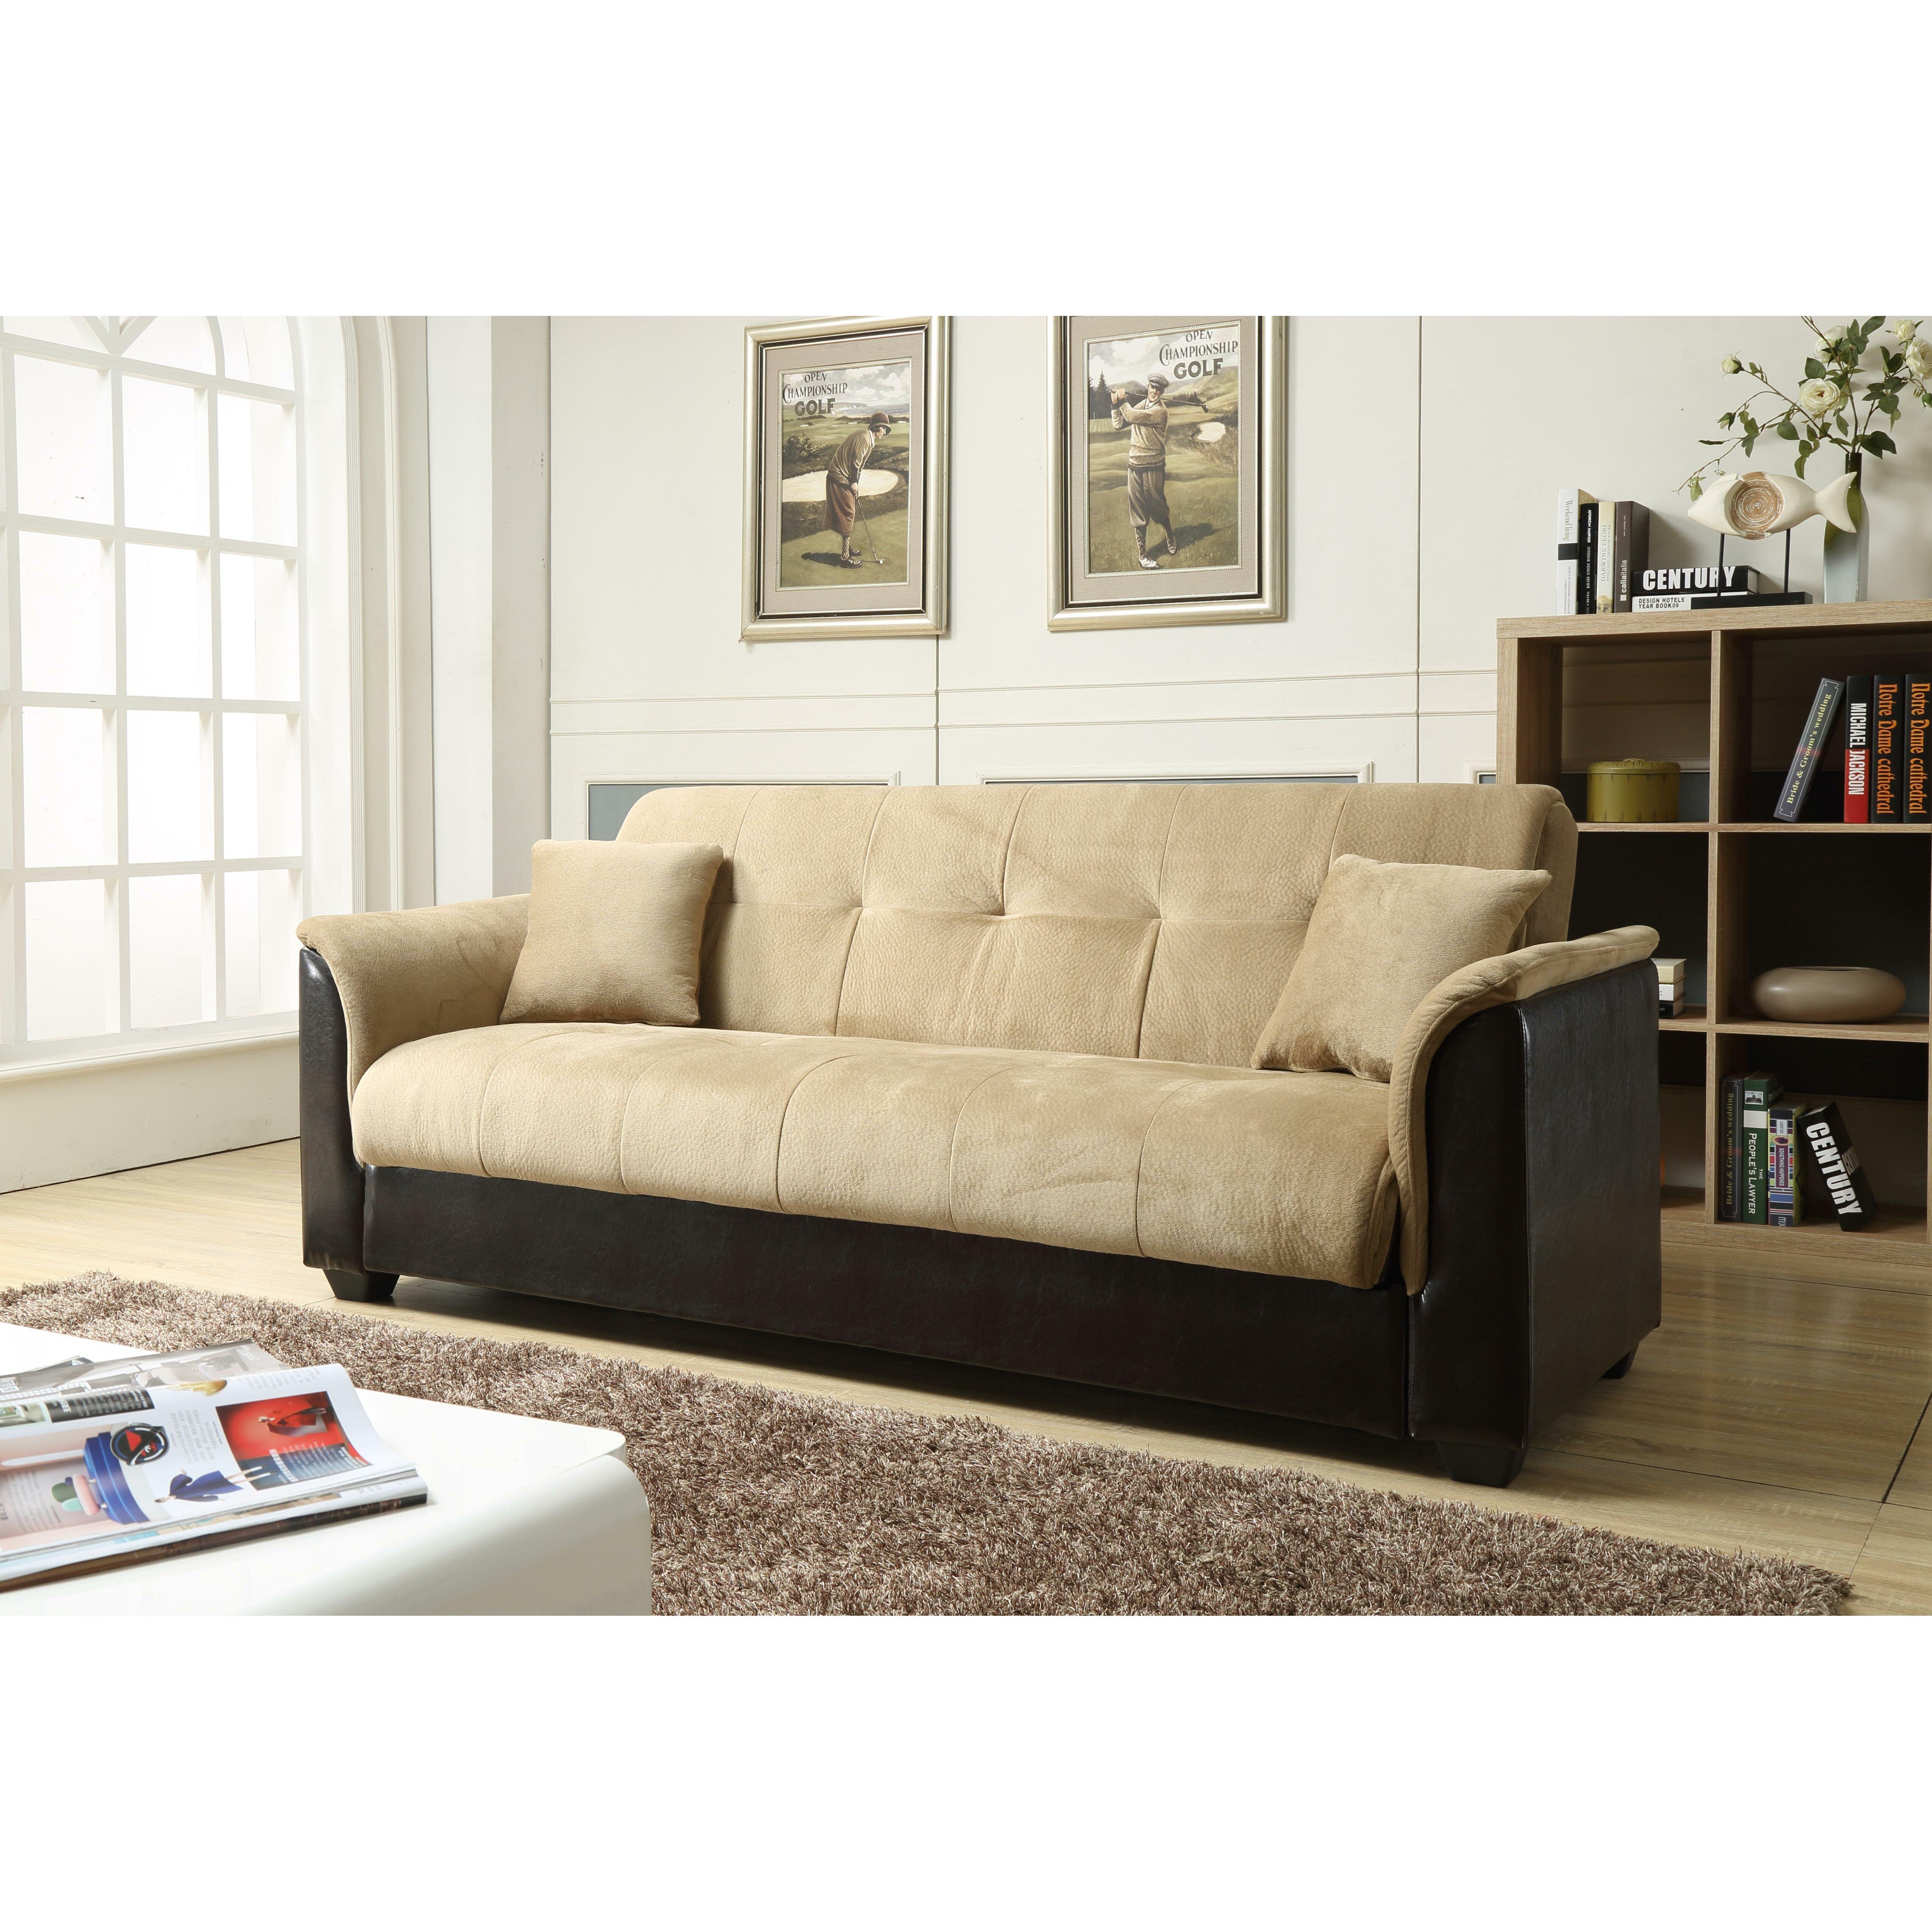 nathanielhome futon sofa reviews wayfair. Black Bedroom Furniture Sets. Home Design Ideas